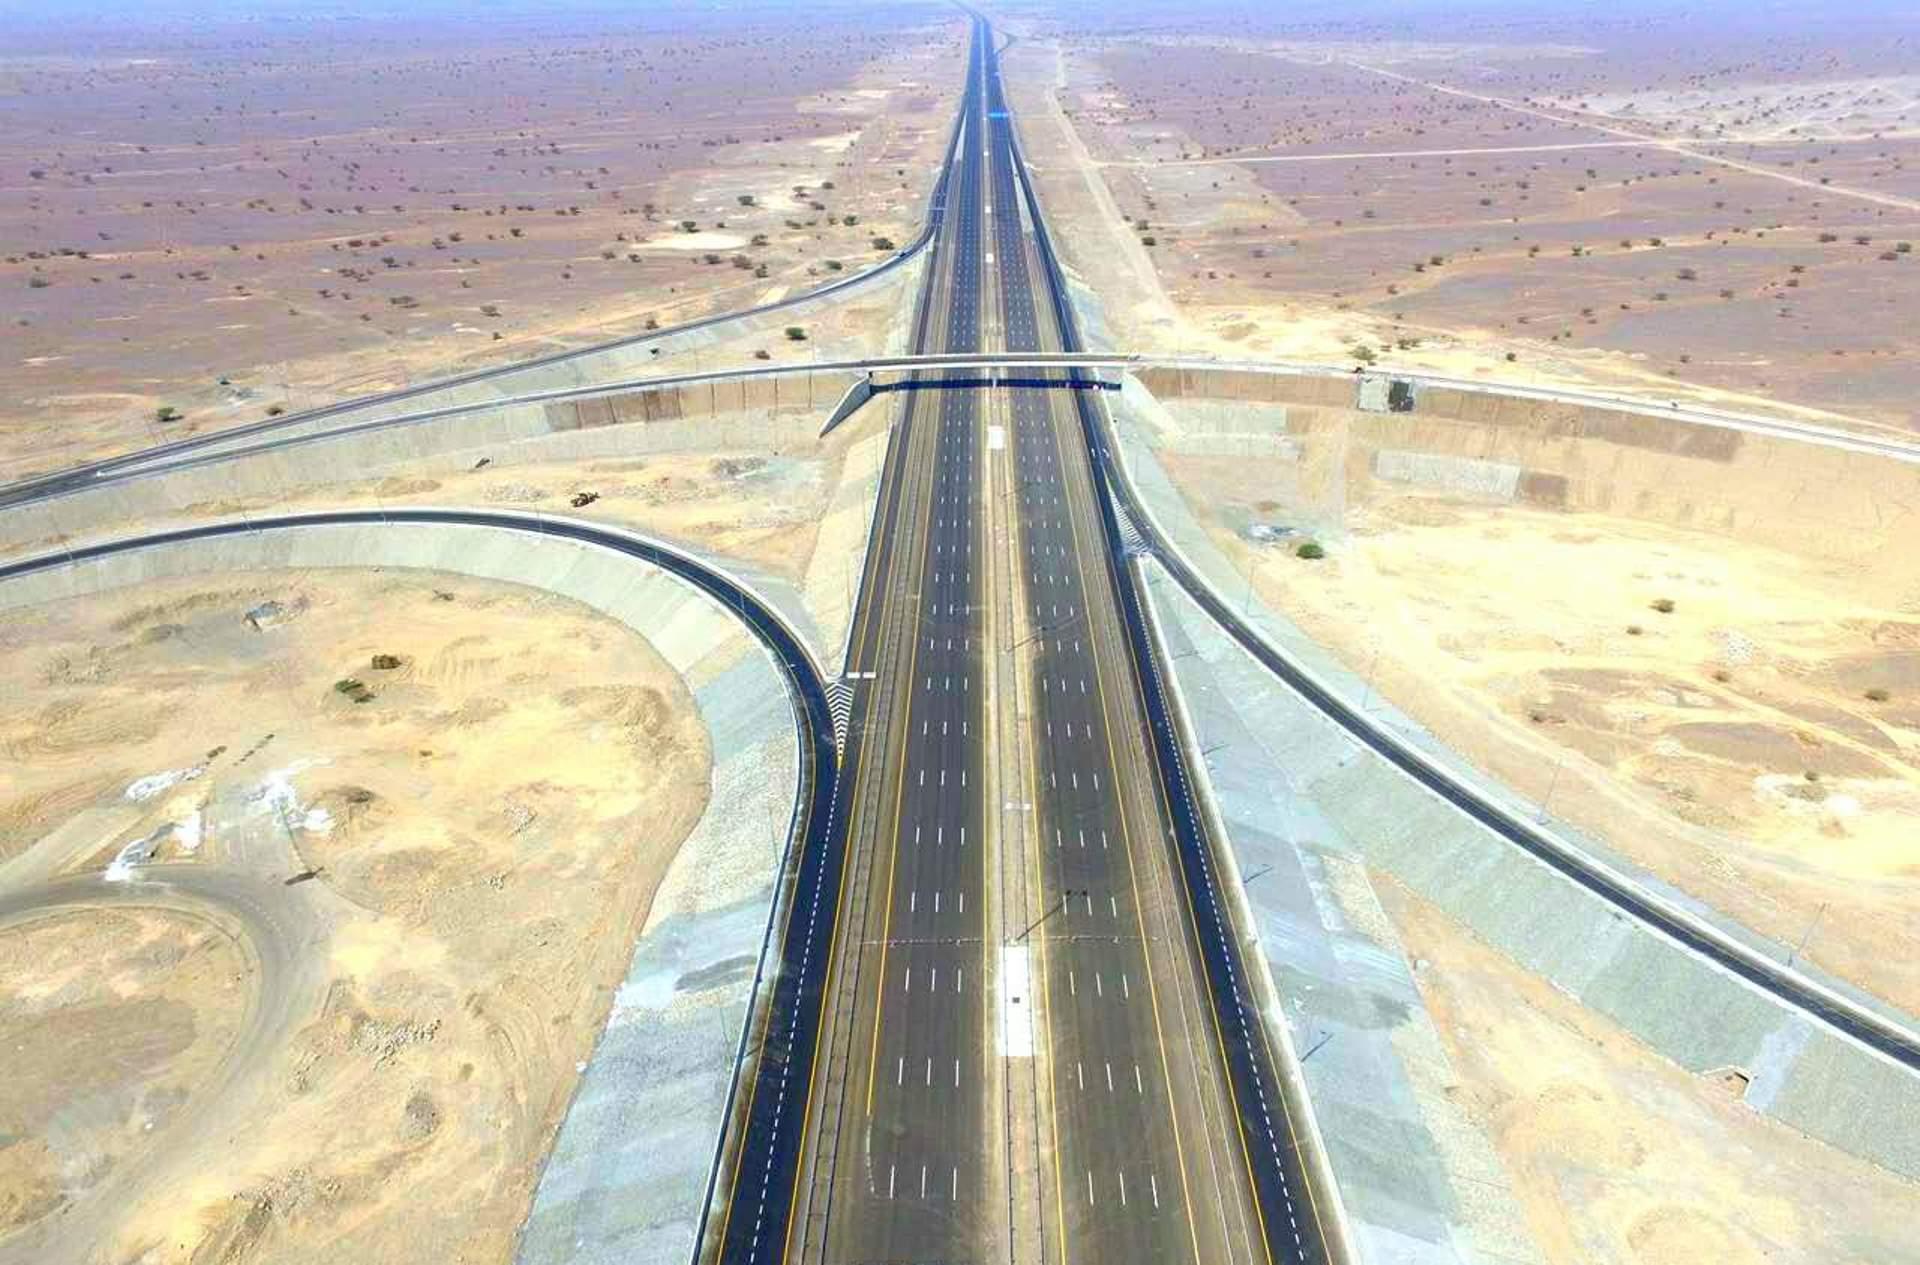 Oman traffic: New section of Al Batinah Expressway opens